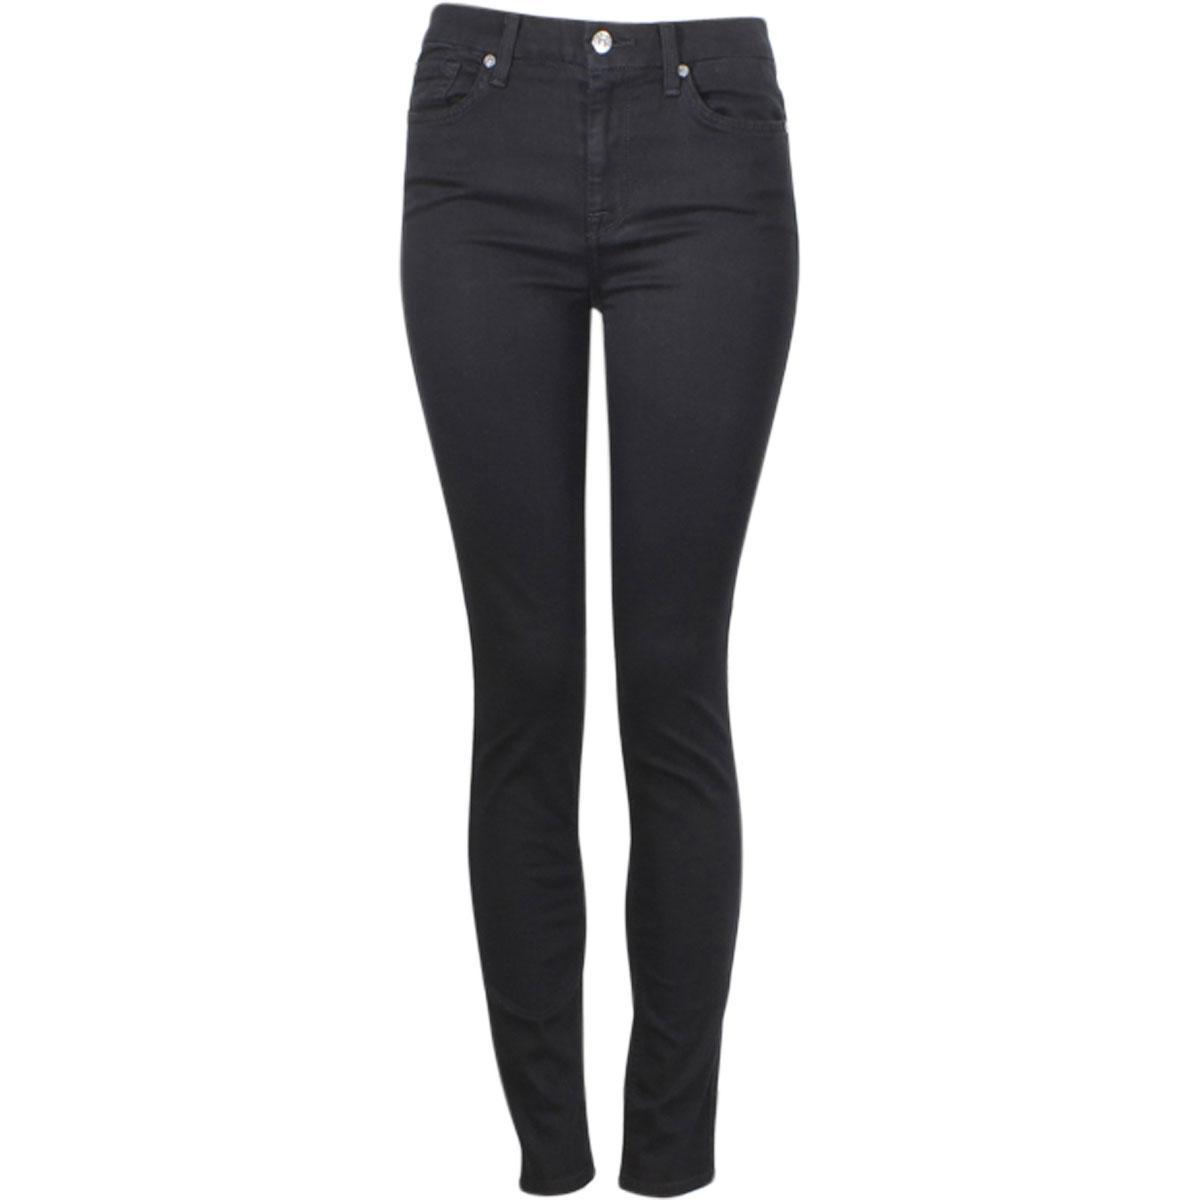 Image of 7 For All Mankind Women's (B)Air Denim The High Waist Skinny Full Length Jeans - Black - 26 (1/2)